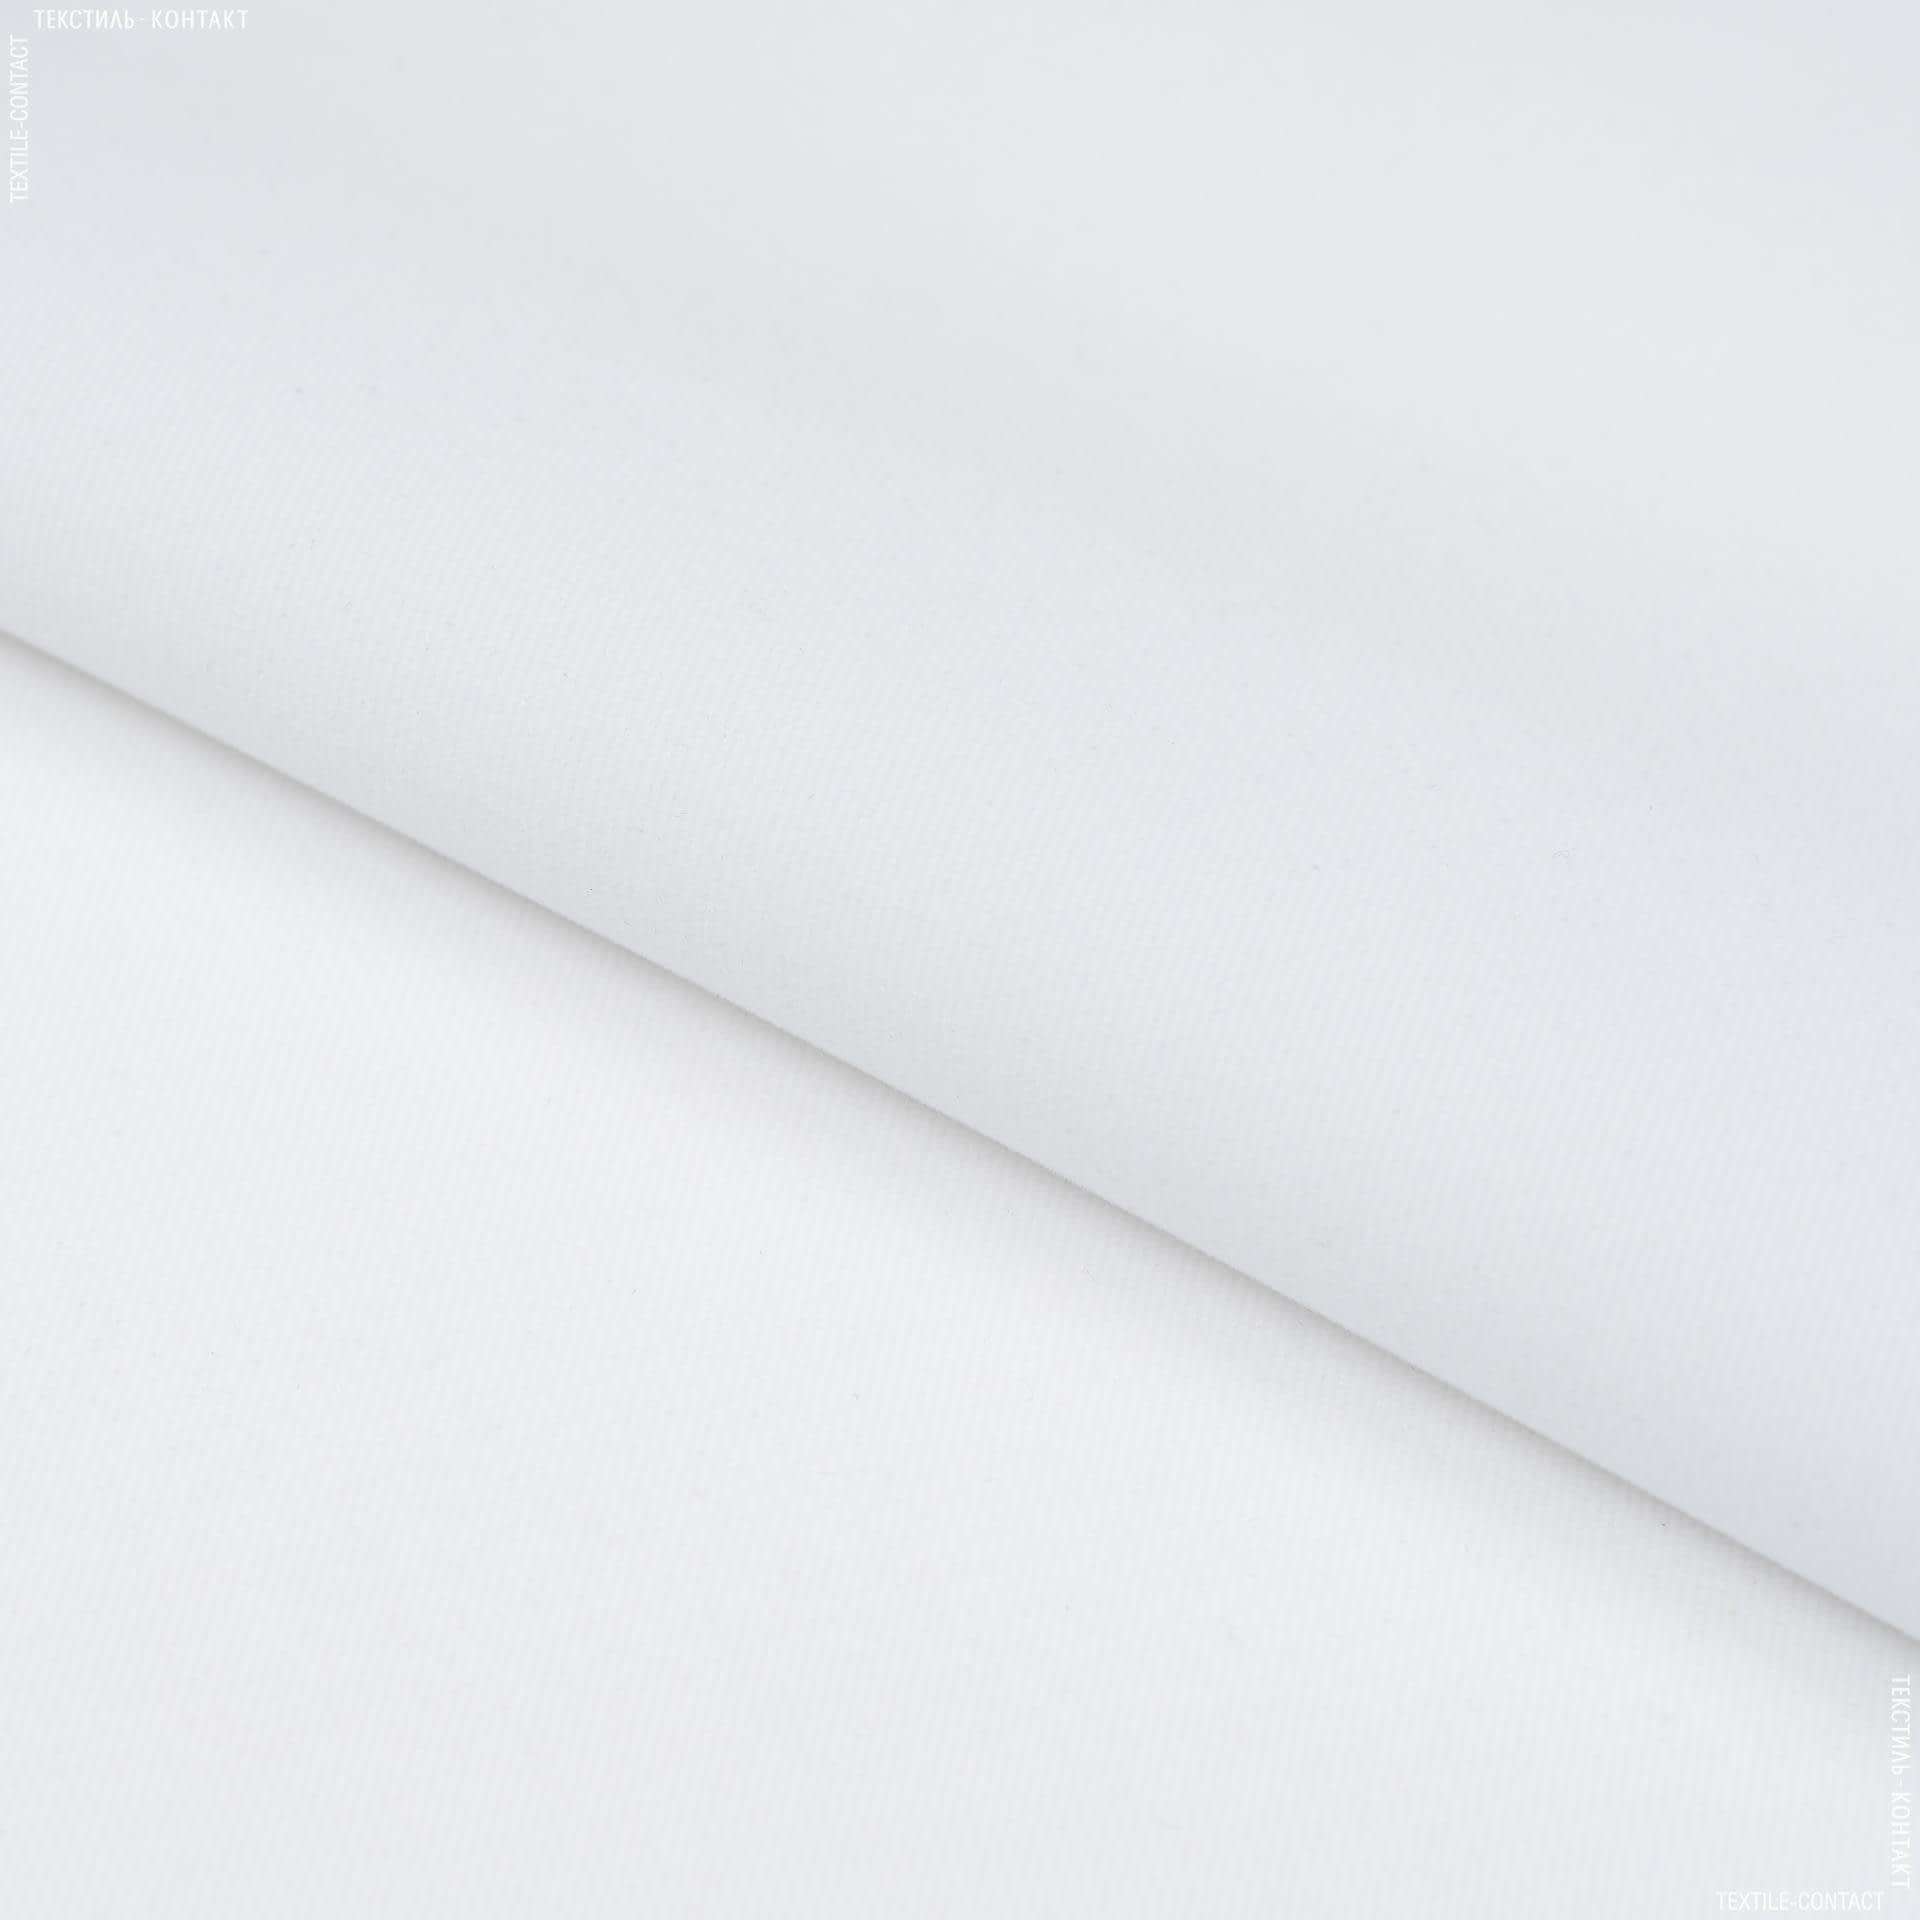 Ткани для рукоделия - Замша искуственная лайт белый